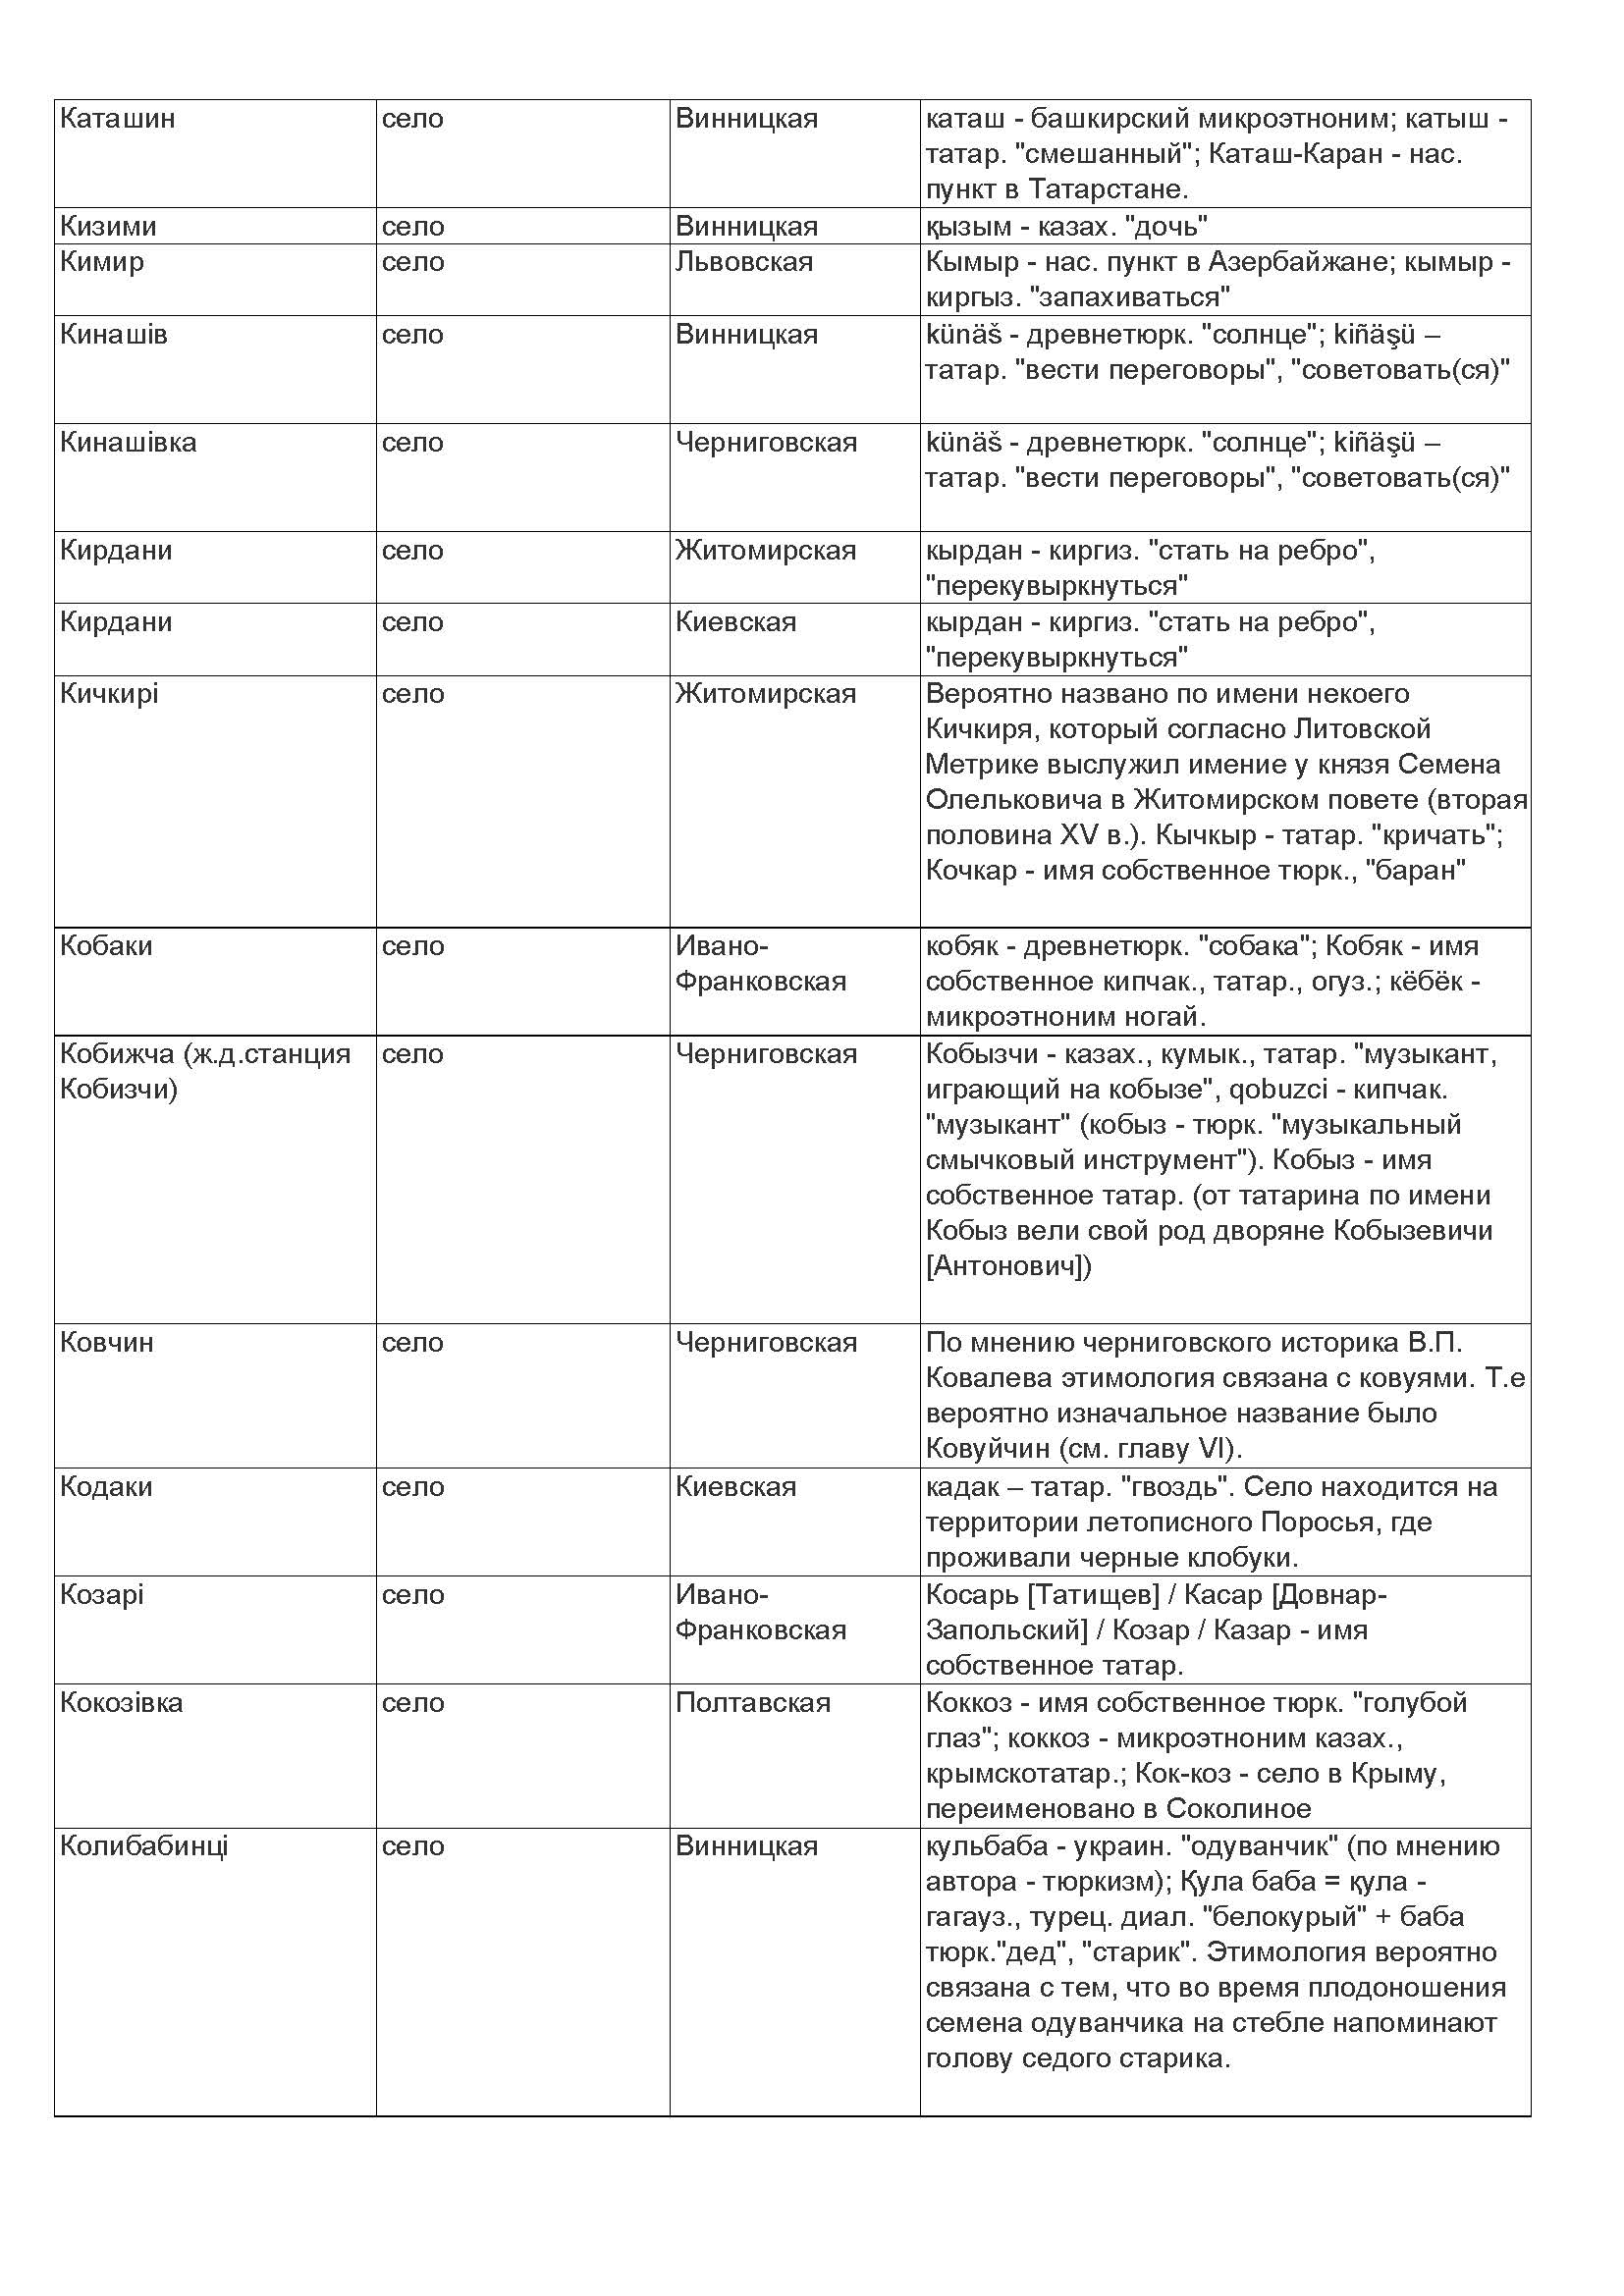 nurki_Страница_11.jpg